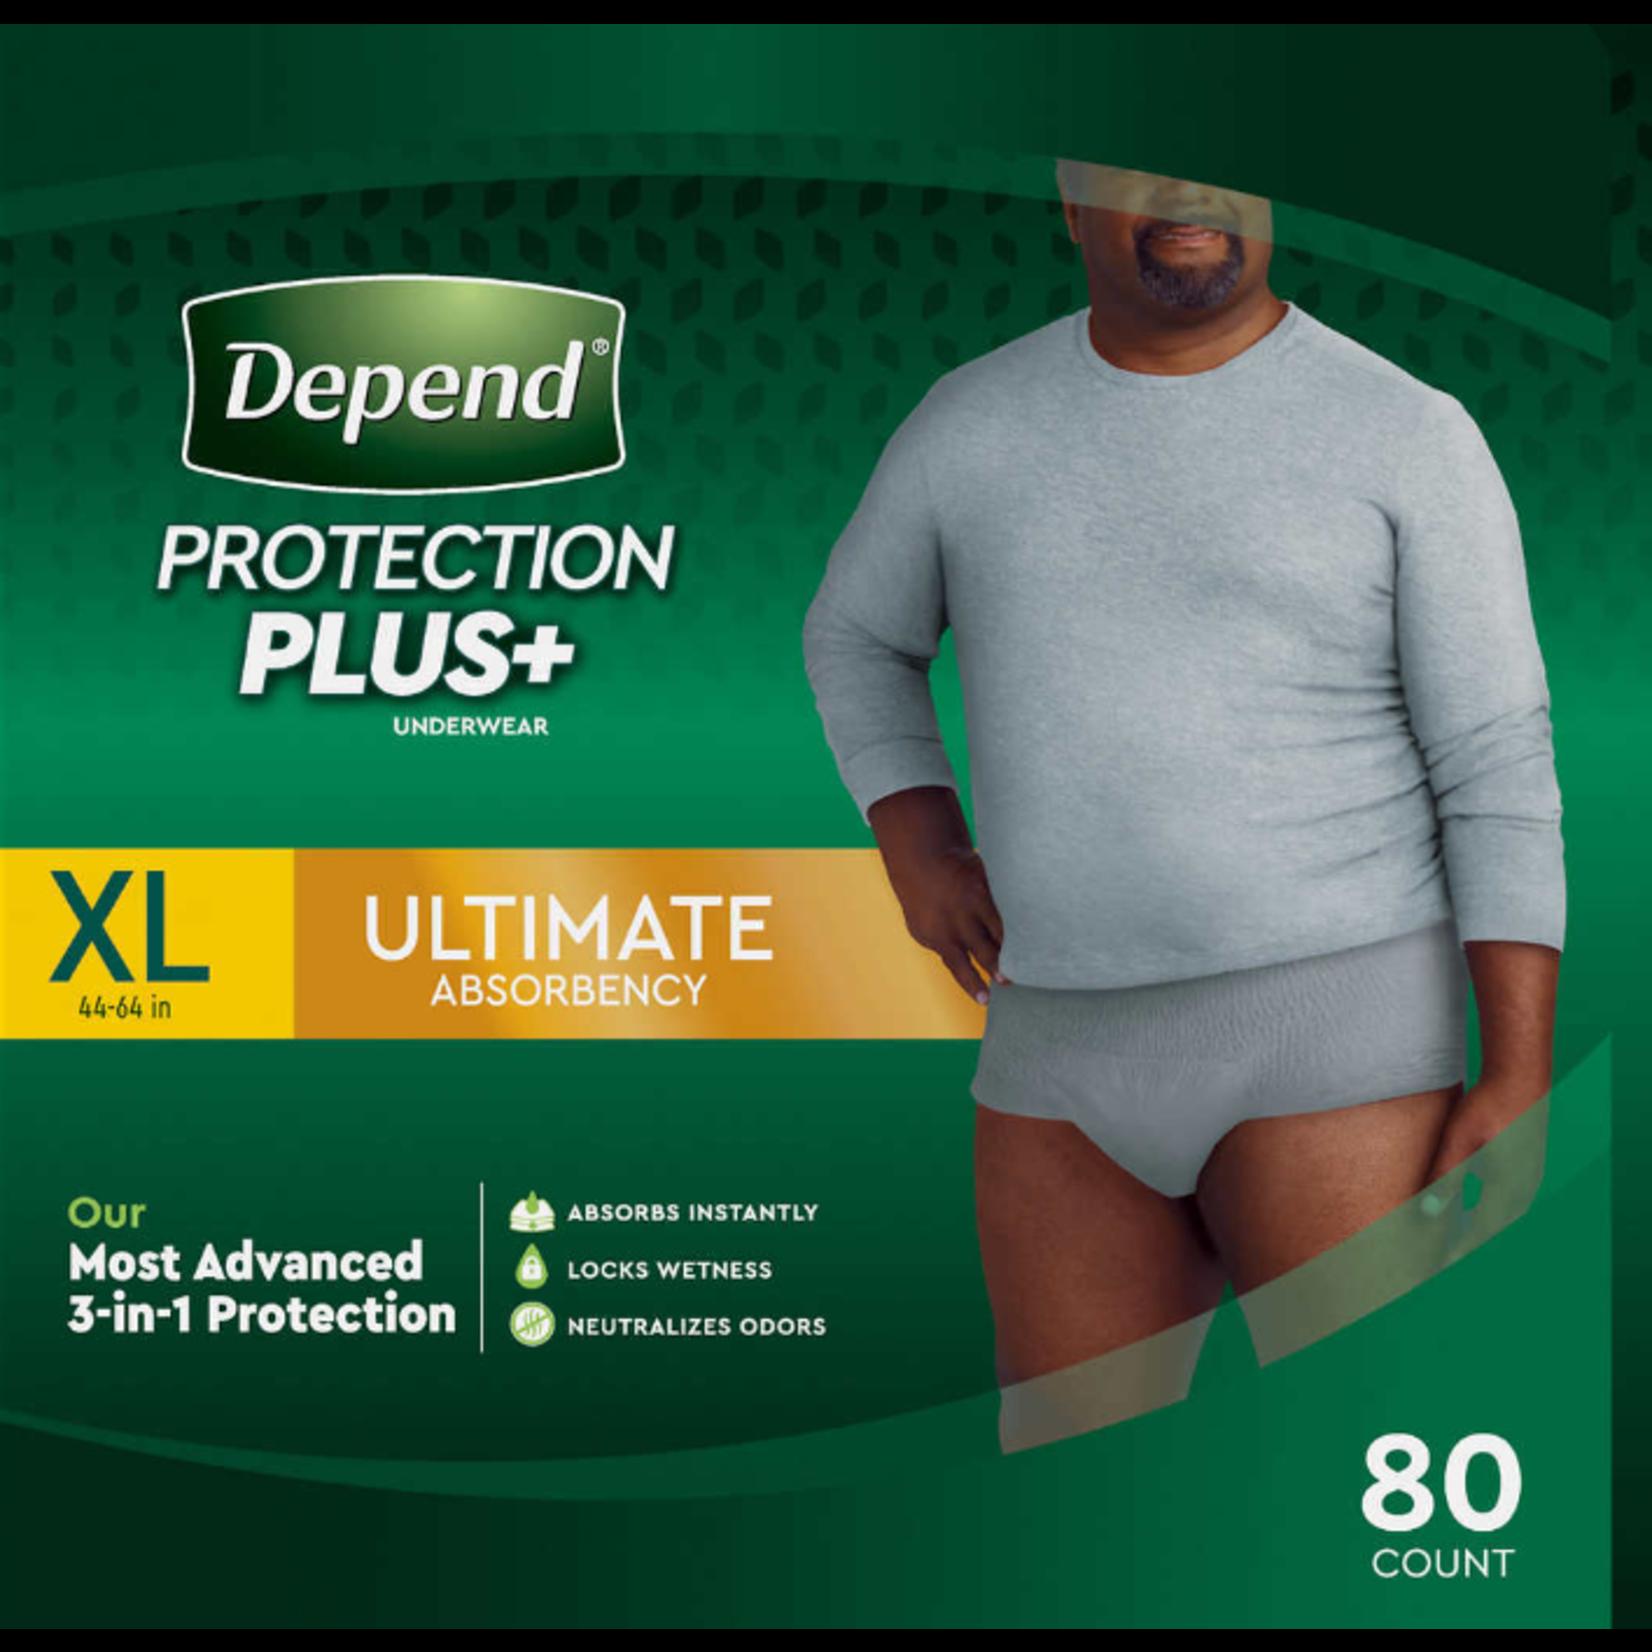 Depends Depends Protection Plus - Men's XL - 80 Pack